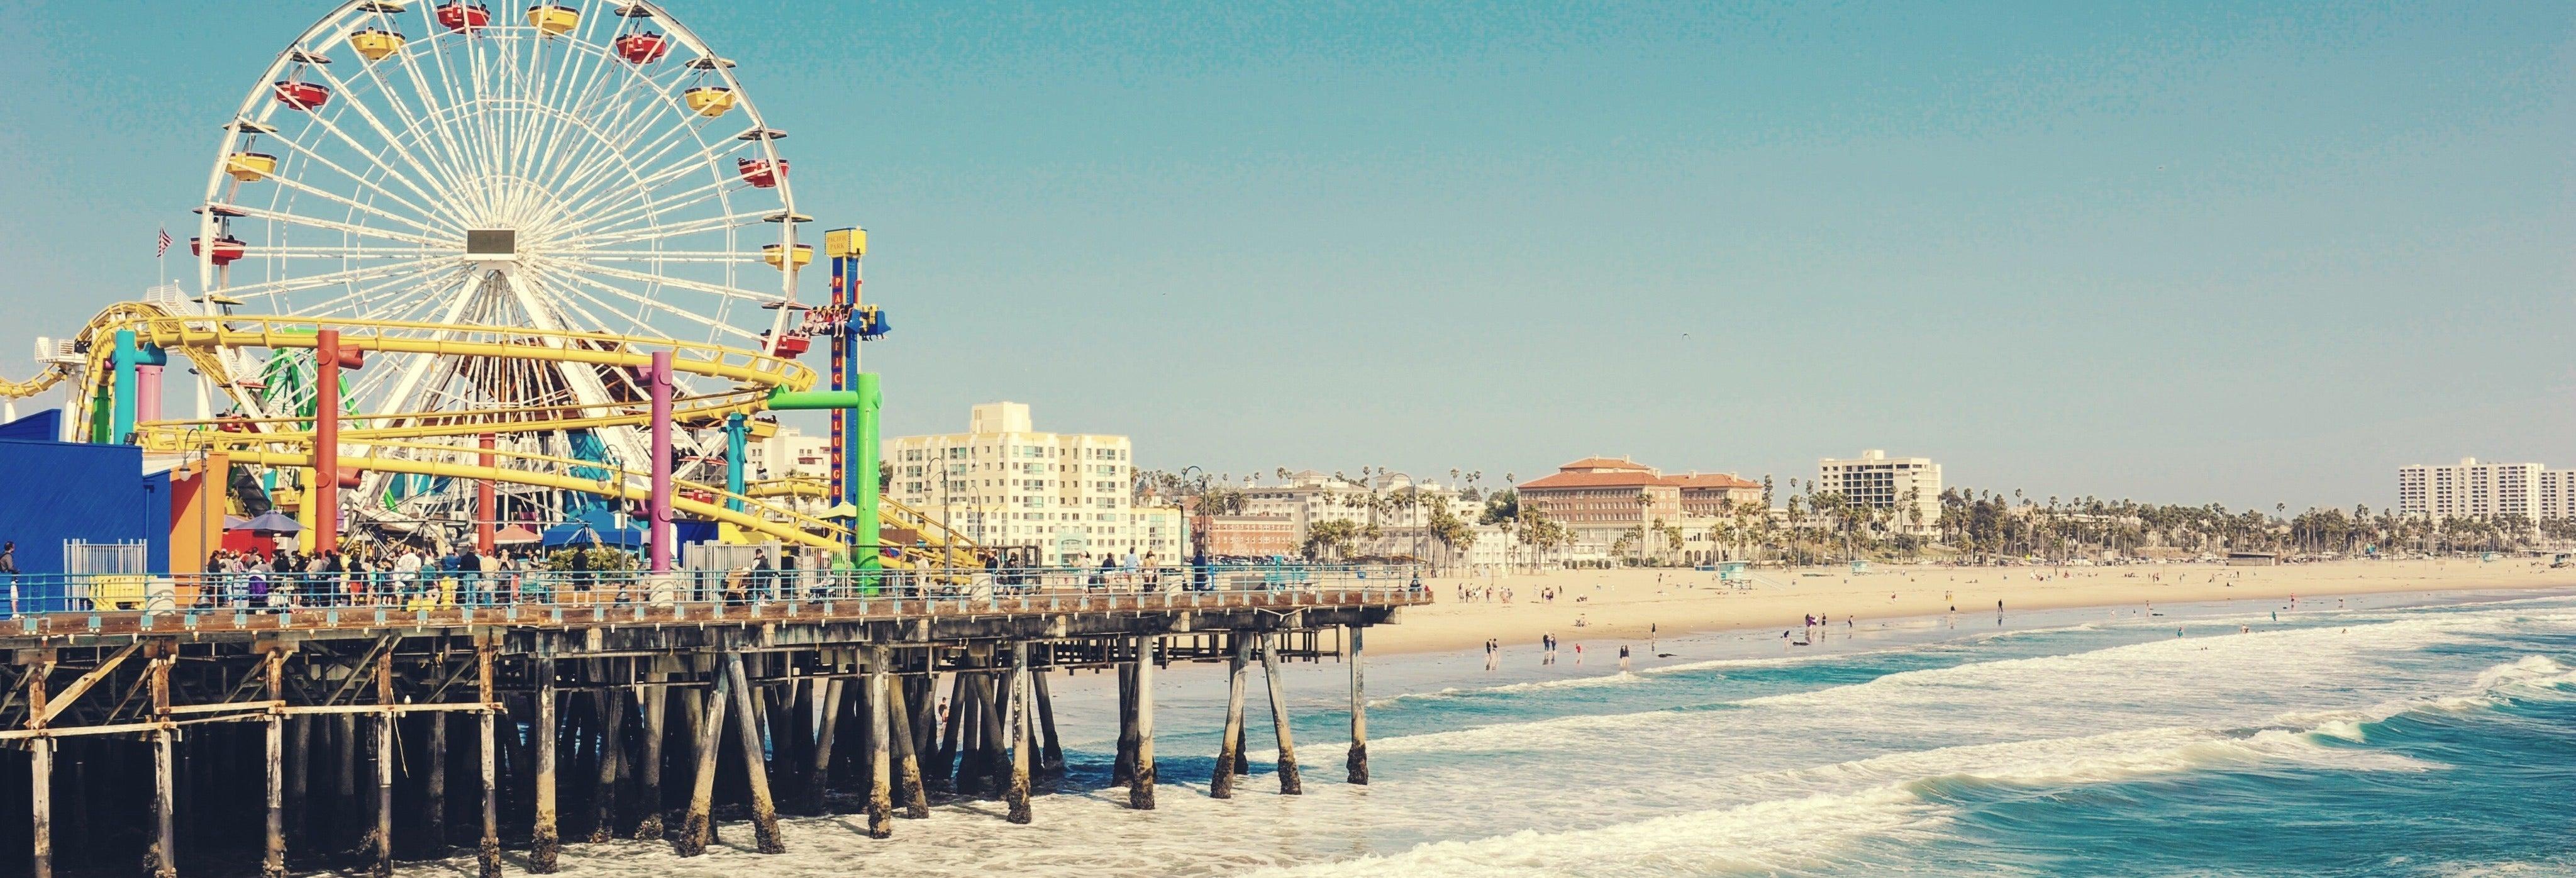 Visite de Venice Beach